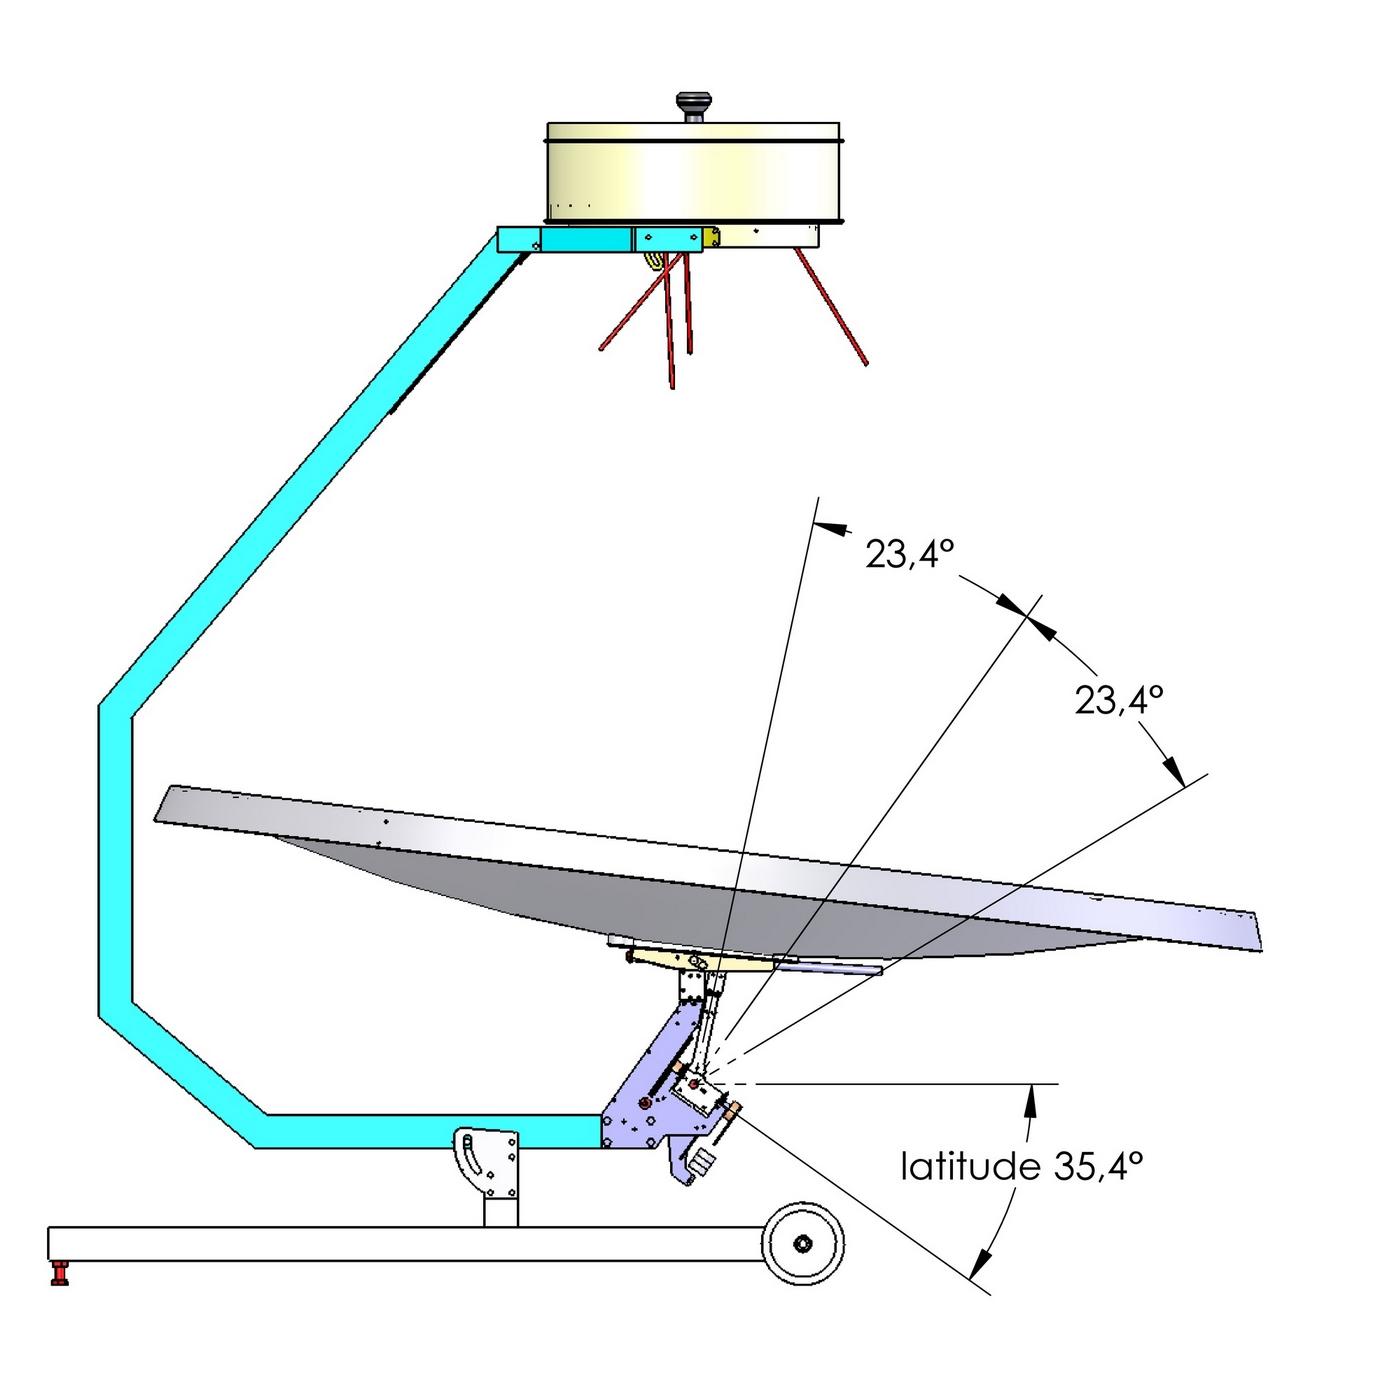 mécanisme triangle: latitude 35.44°, zénith, solstice été